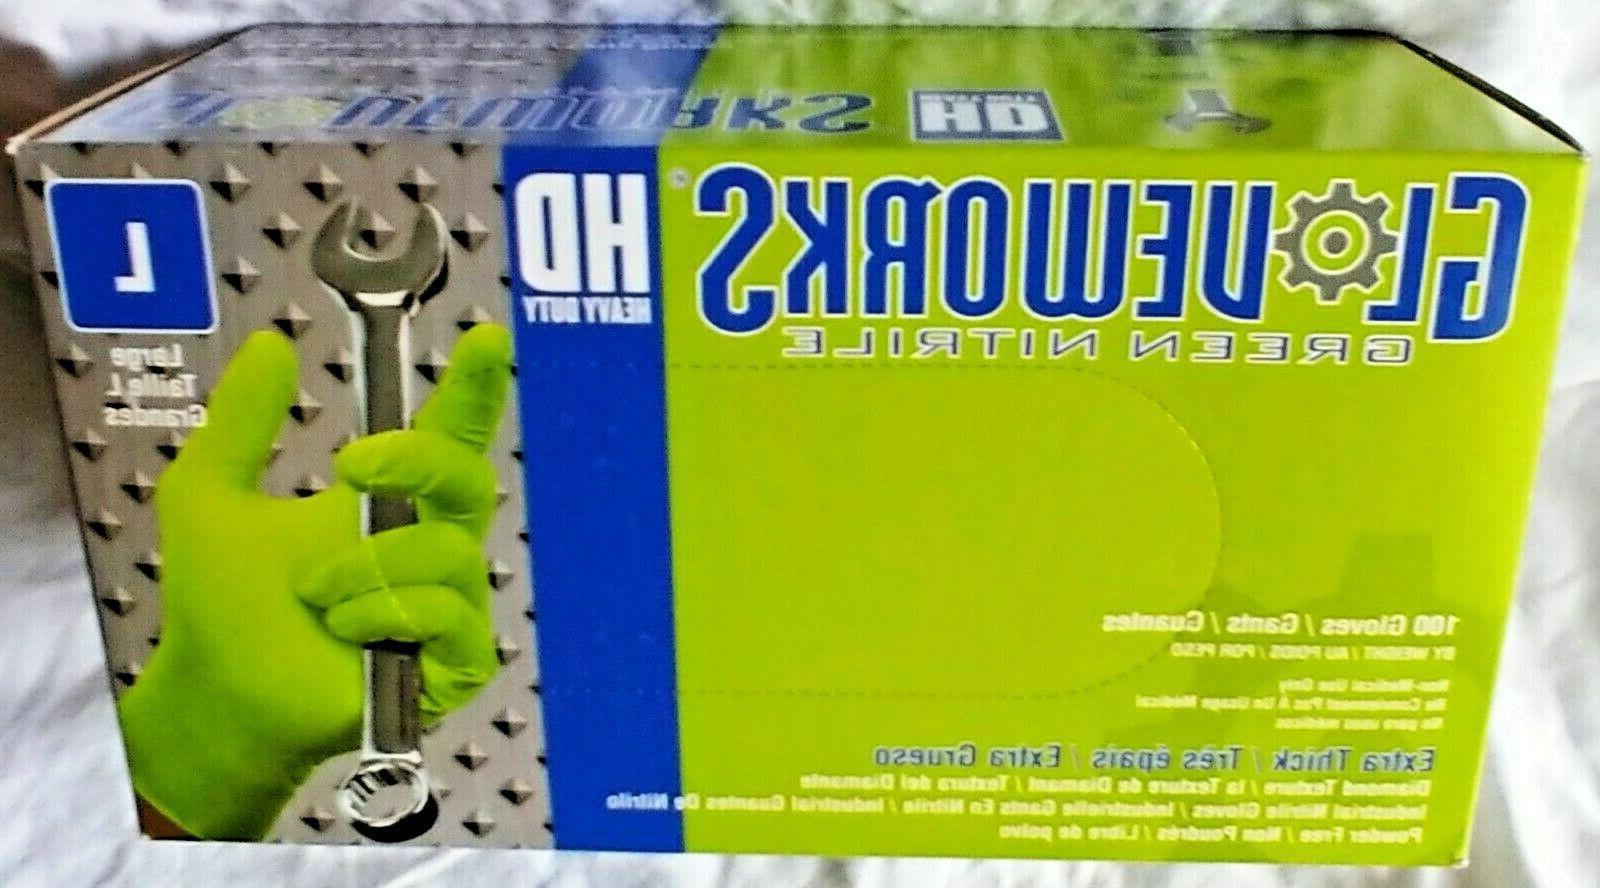 GloveWorks HD Green Latex Industrial Powder Free 8MIL